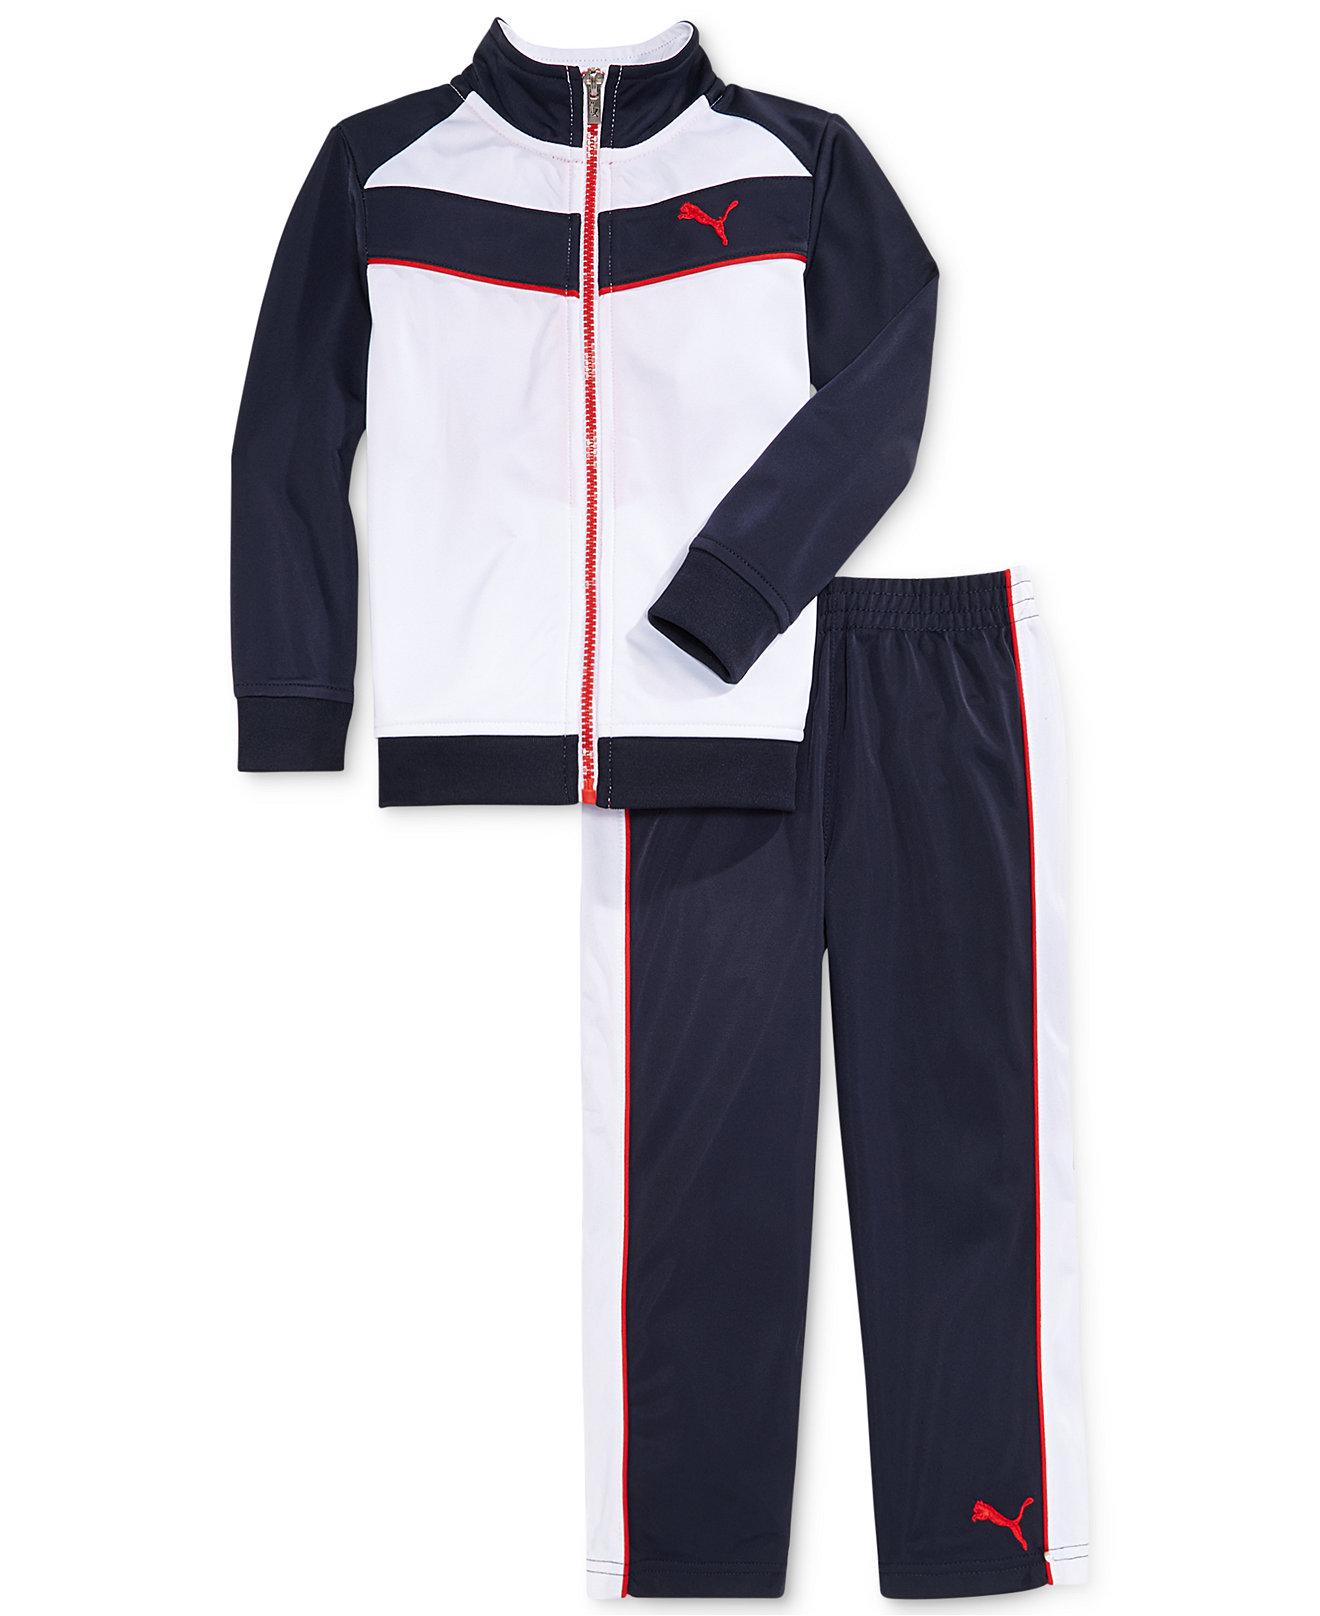 детский костюм Puma  2015 детский костюм ruotemi rtm15b0053 2015